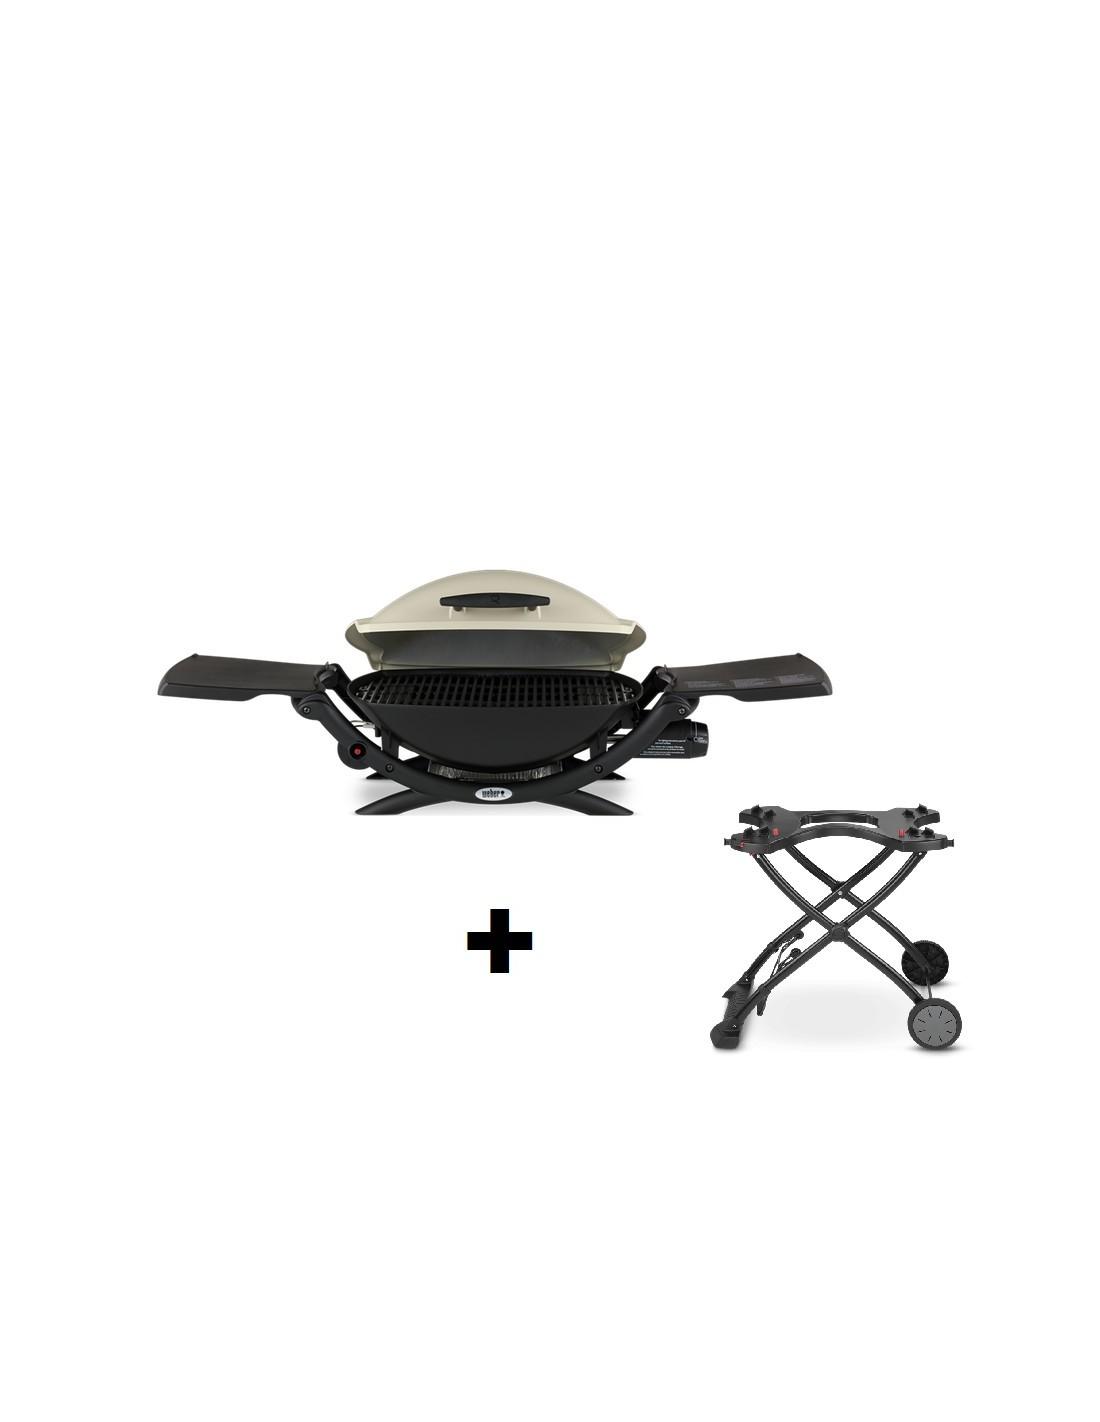 pack barbecue gaz q 2000 titanium weber chariot pliant. Black Bedroom Furniture Sets. Home Design Ideas